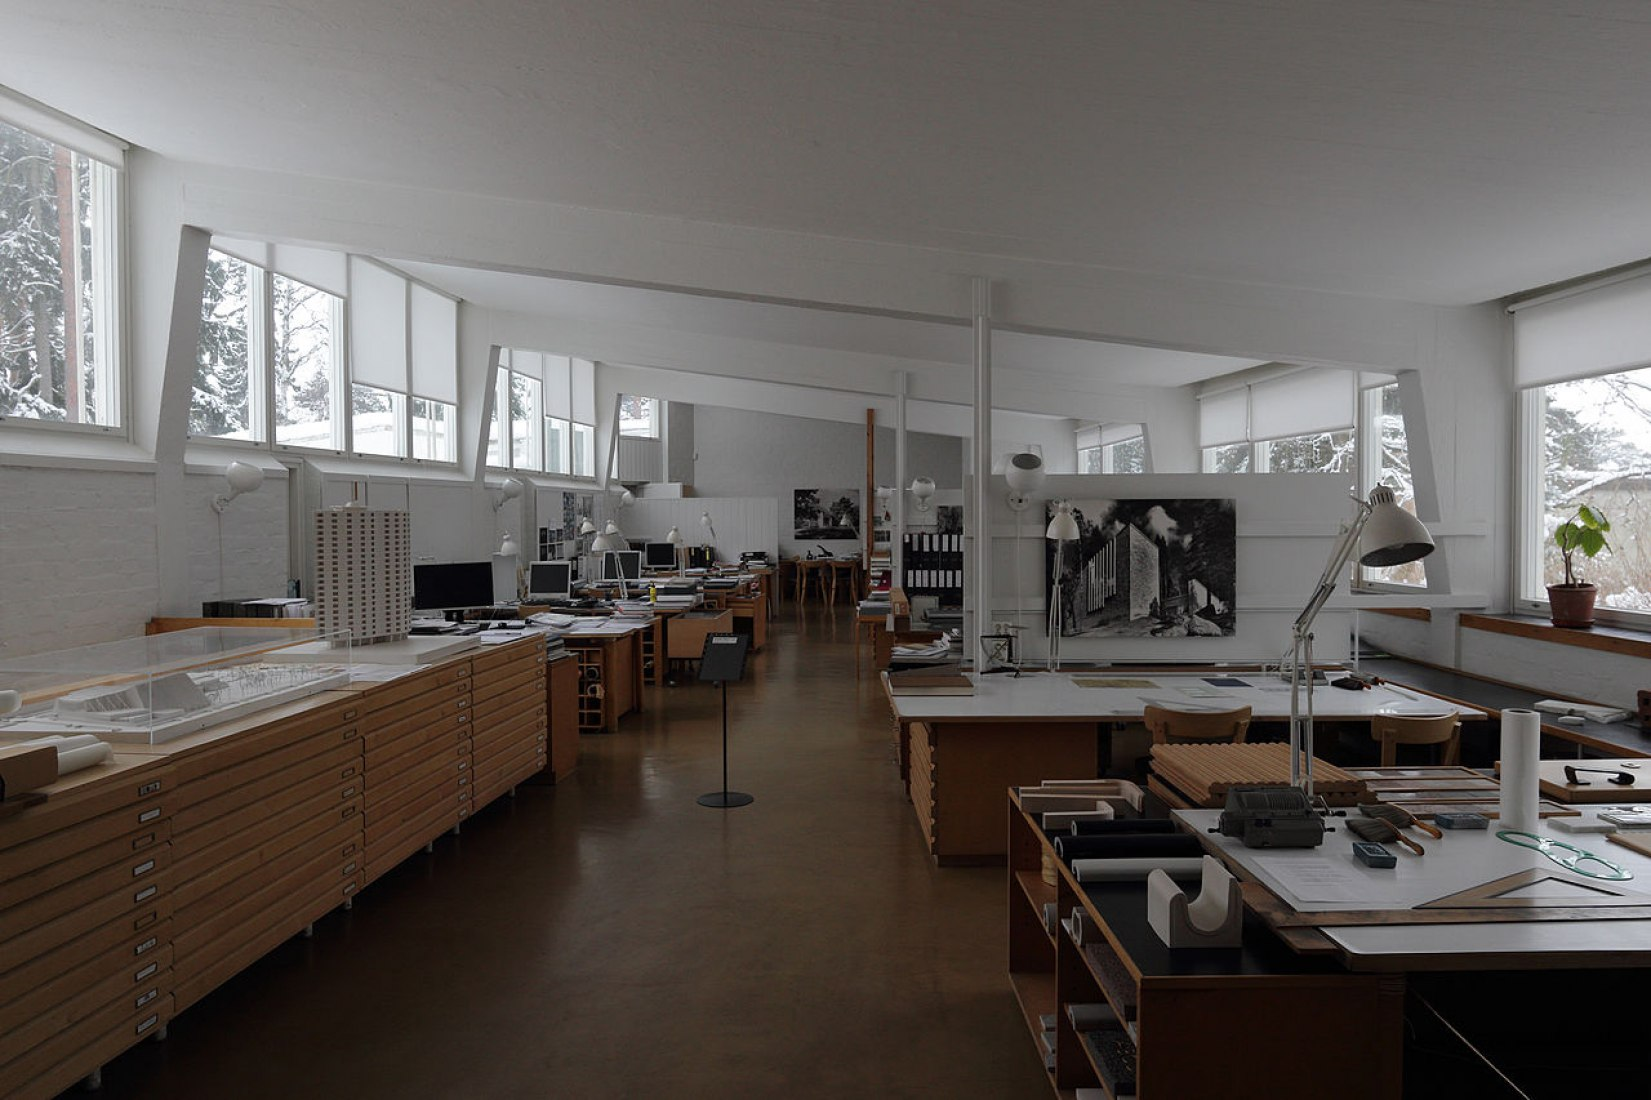 Vista interior. Estudio Aalto Helsinki, Helsinki (1954–56). Fotografía © Pepechibiryu.